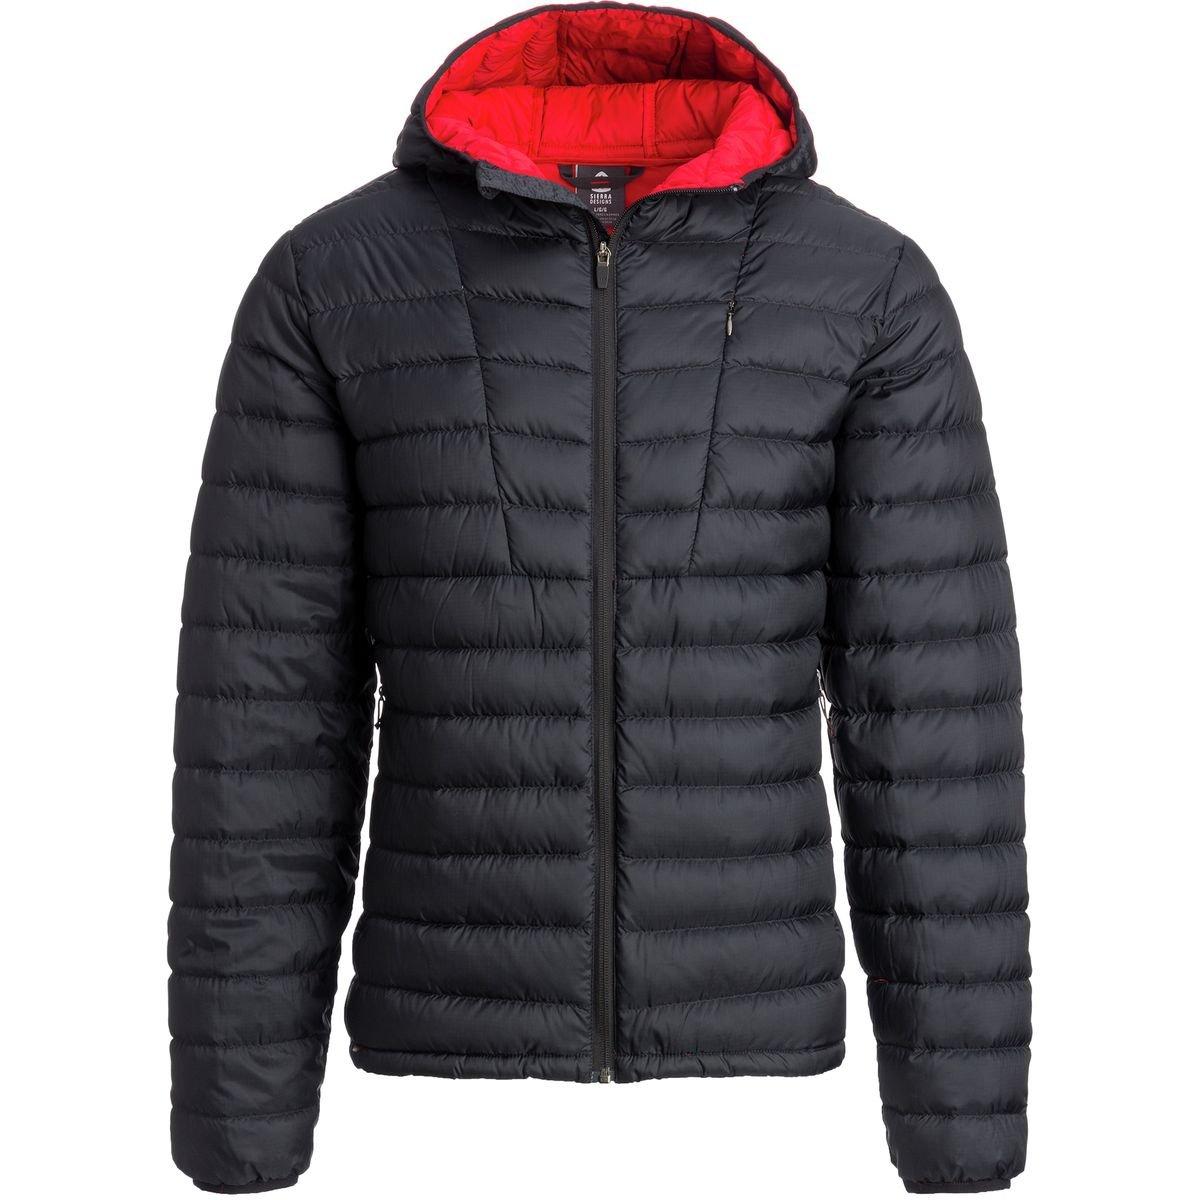 Sierra Designs Whitneyフード付きダウンジャケット – メンズ B076JGTJBQ Small|ブラック ブラック Small